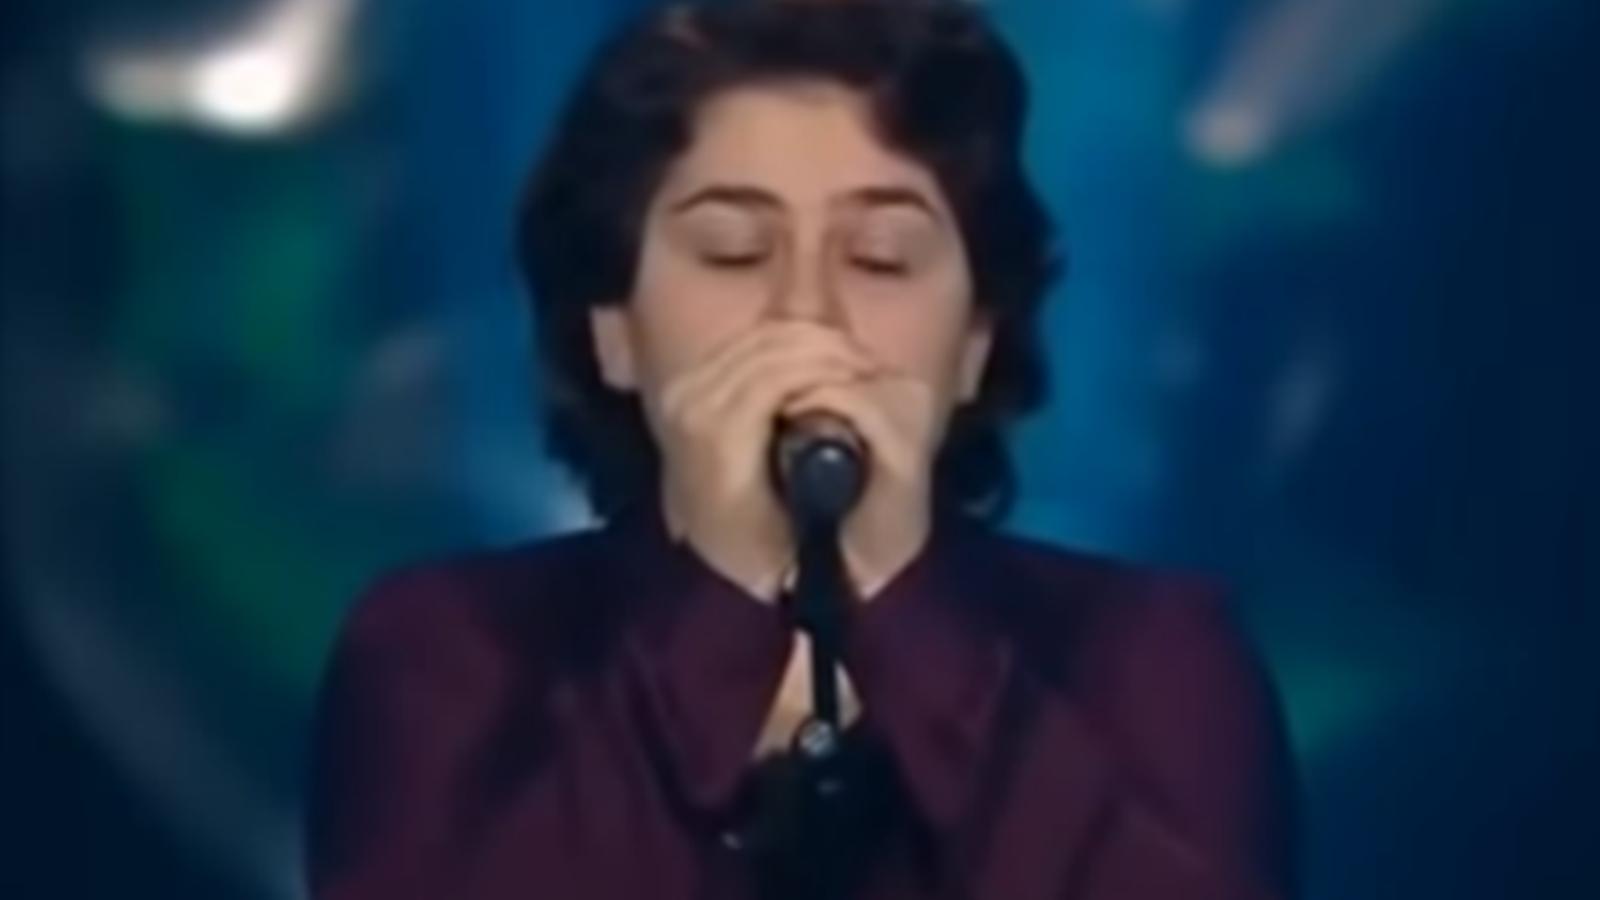 Syrian 'the Voice Finland' Contestant Joli Malki Is a Name